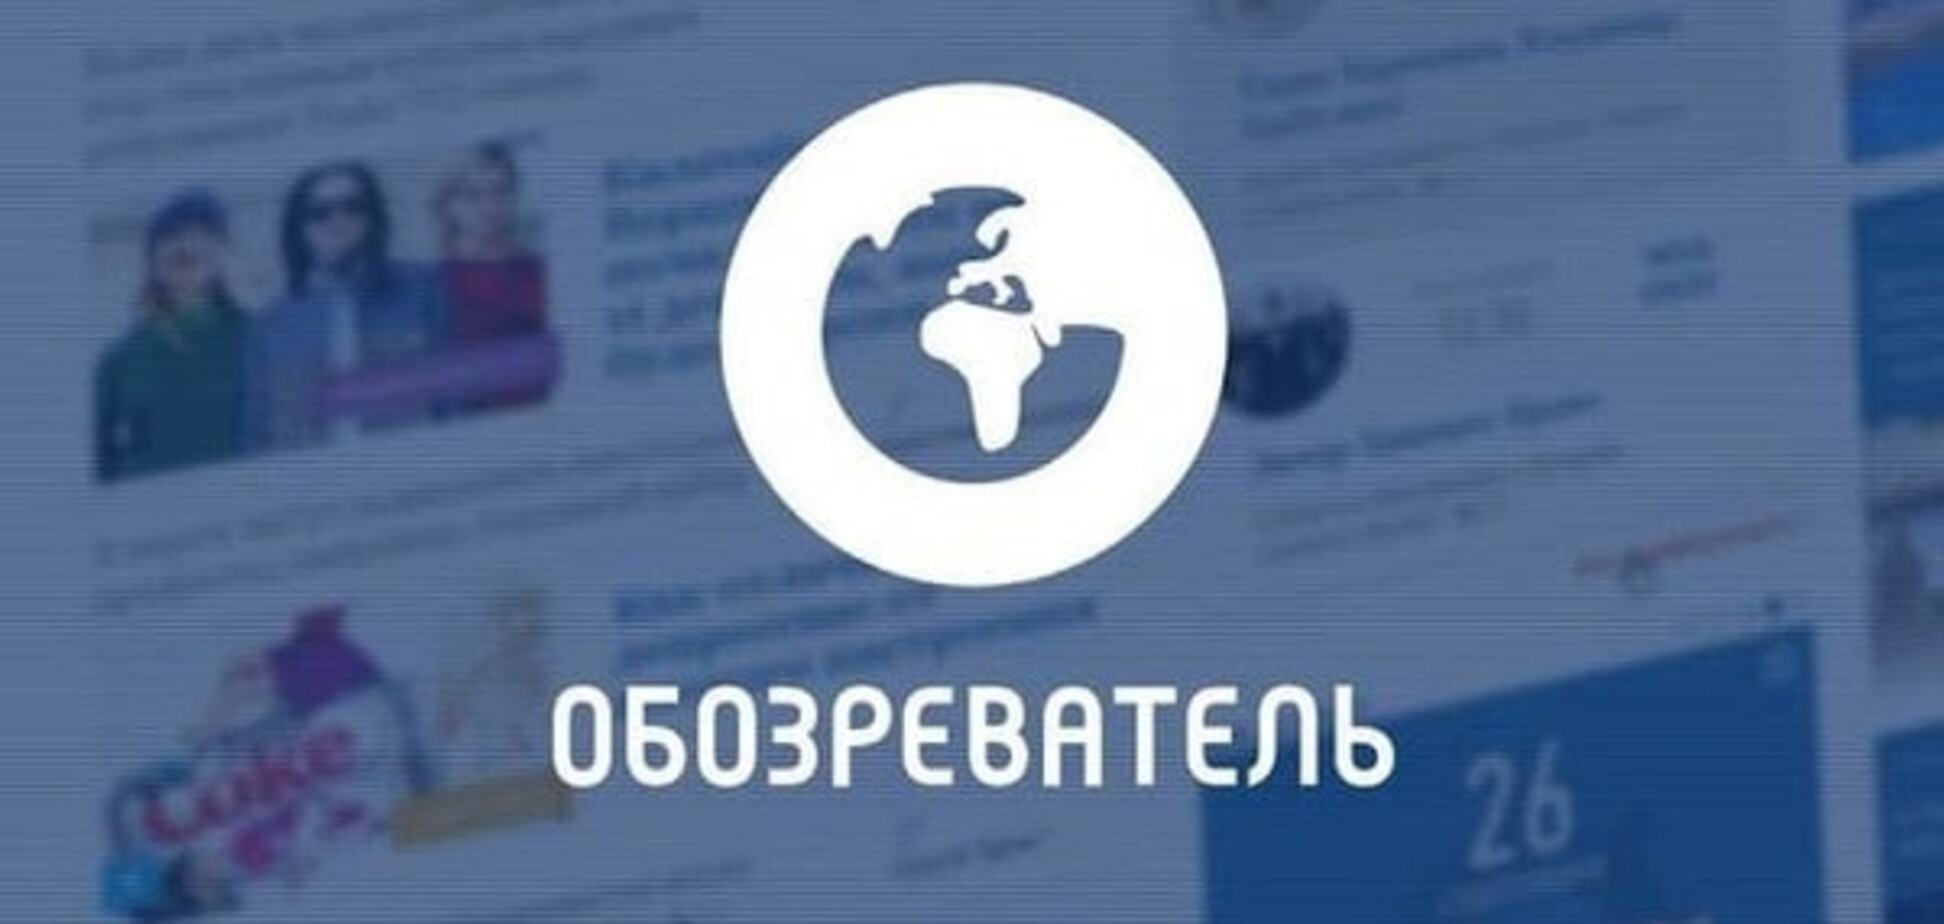 Як 'Нафтогаз' кинув 'Газпром'